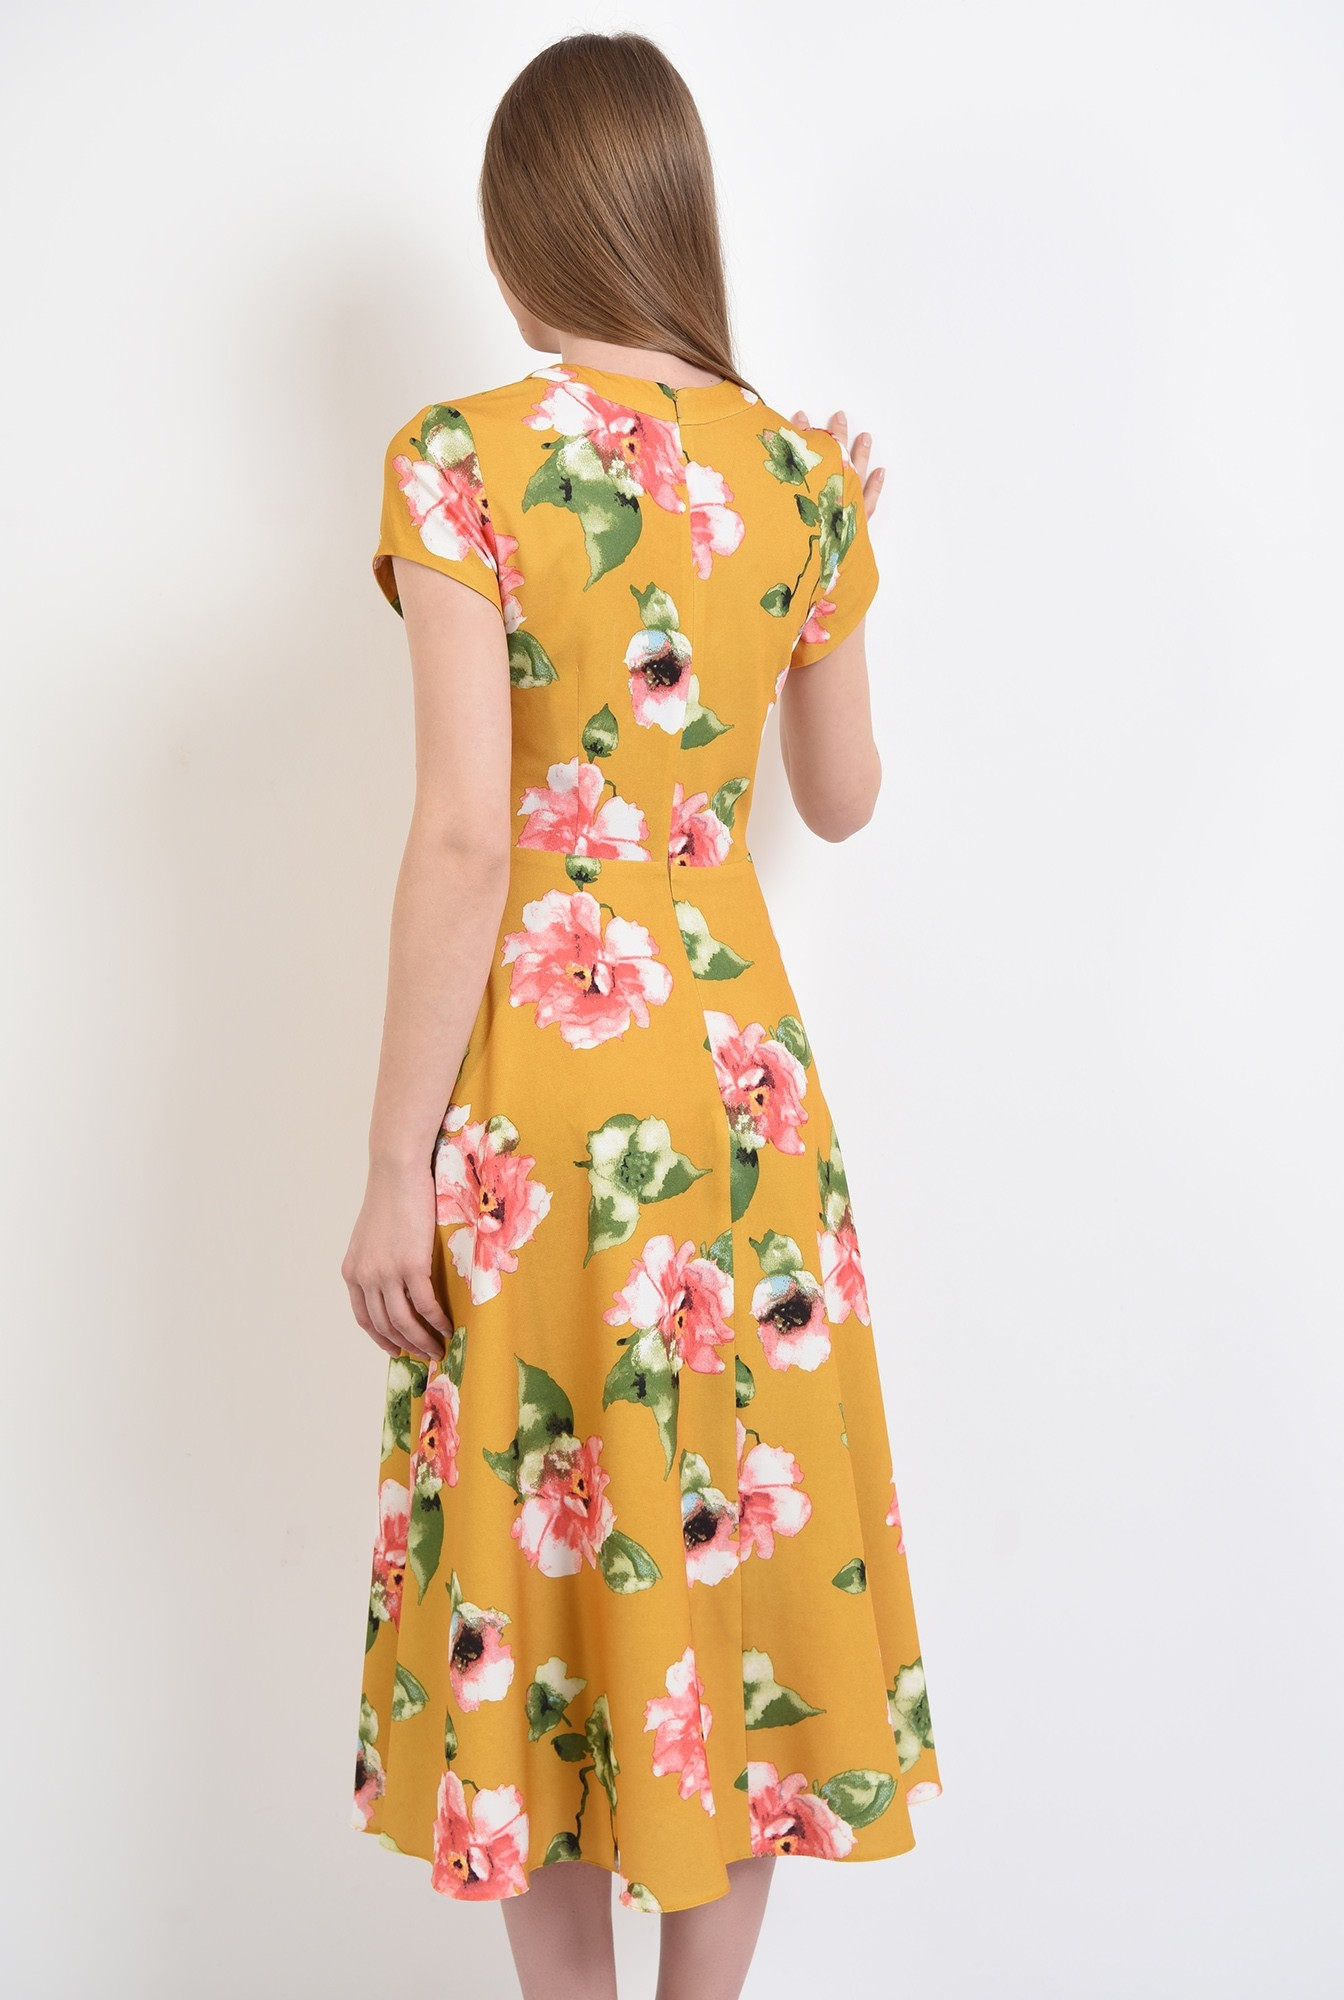 1 - 360 - rochie de primavara, midi, evazata, cu imprimeu floral, Poema